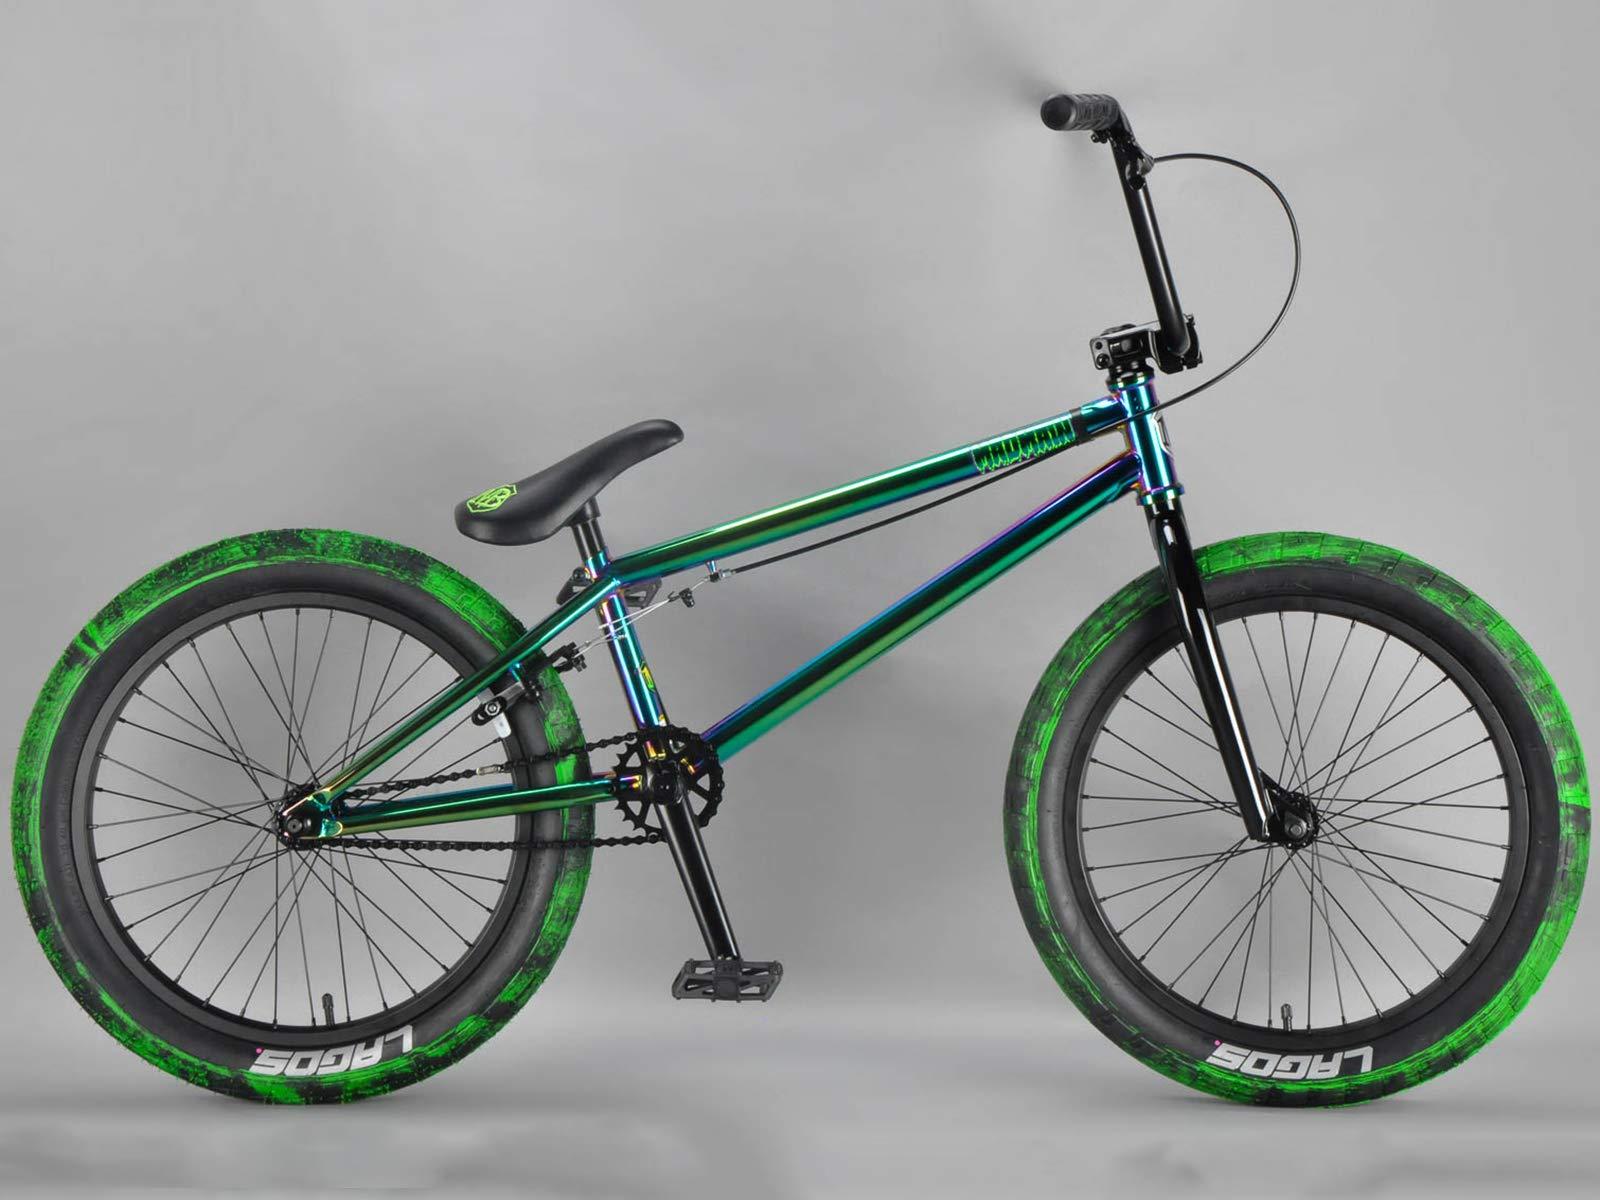 Mafiabikes Harry Main 20 inch Green Fuel BMX Bike